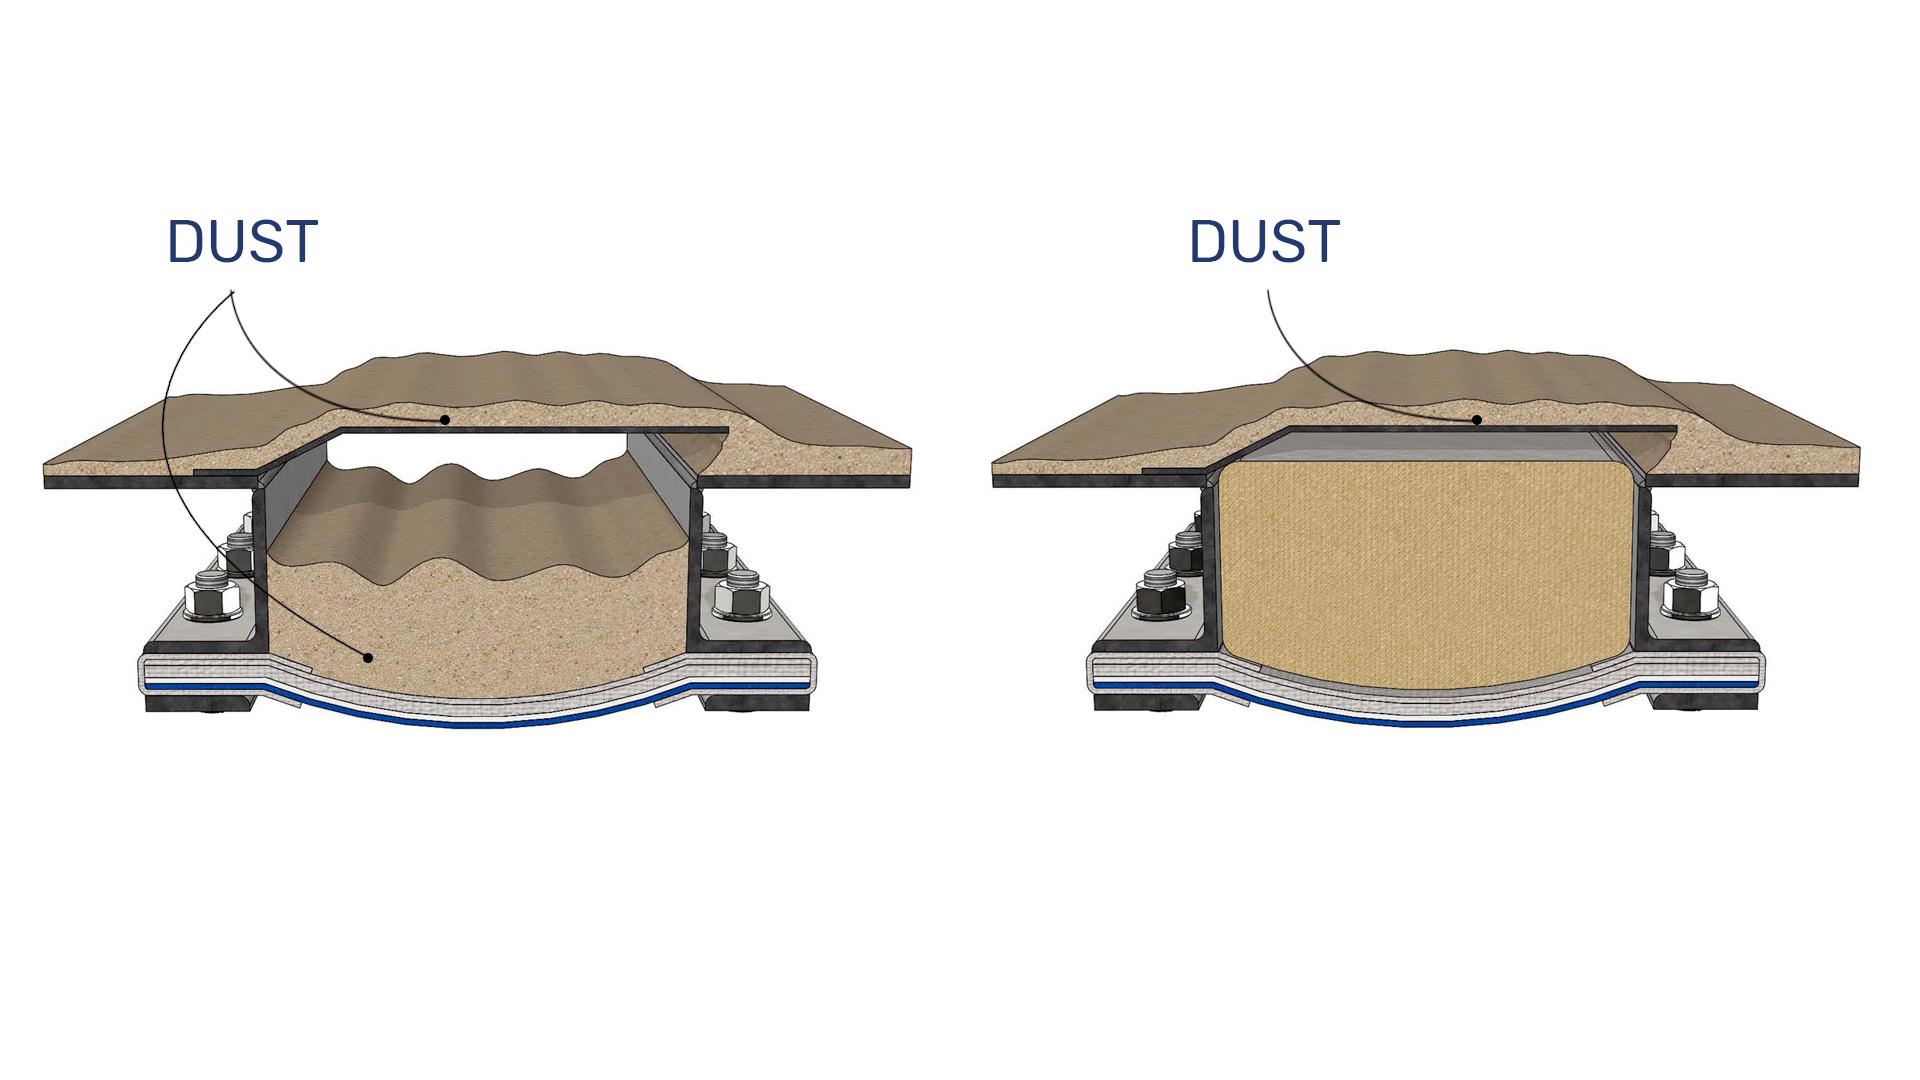 precence of dust